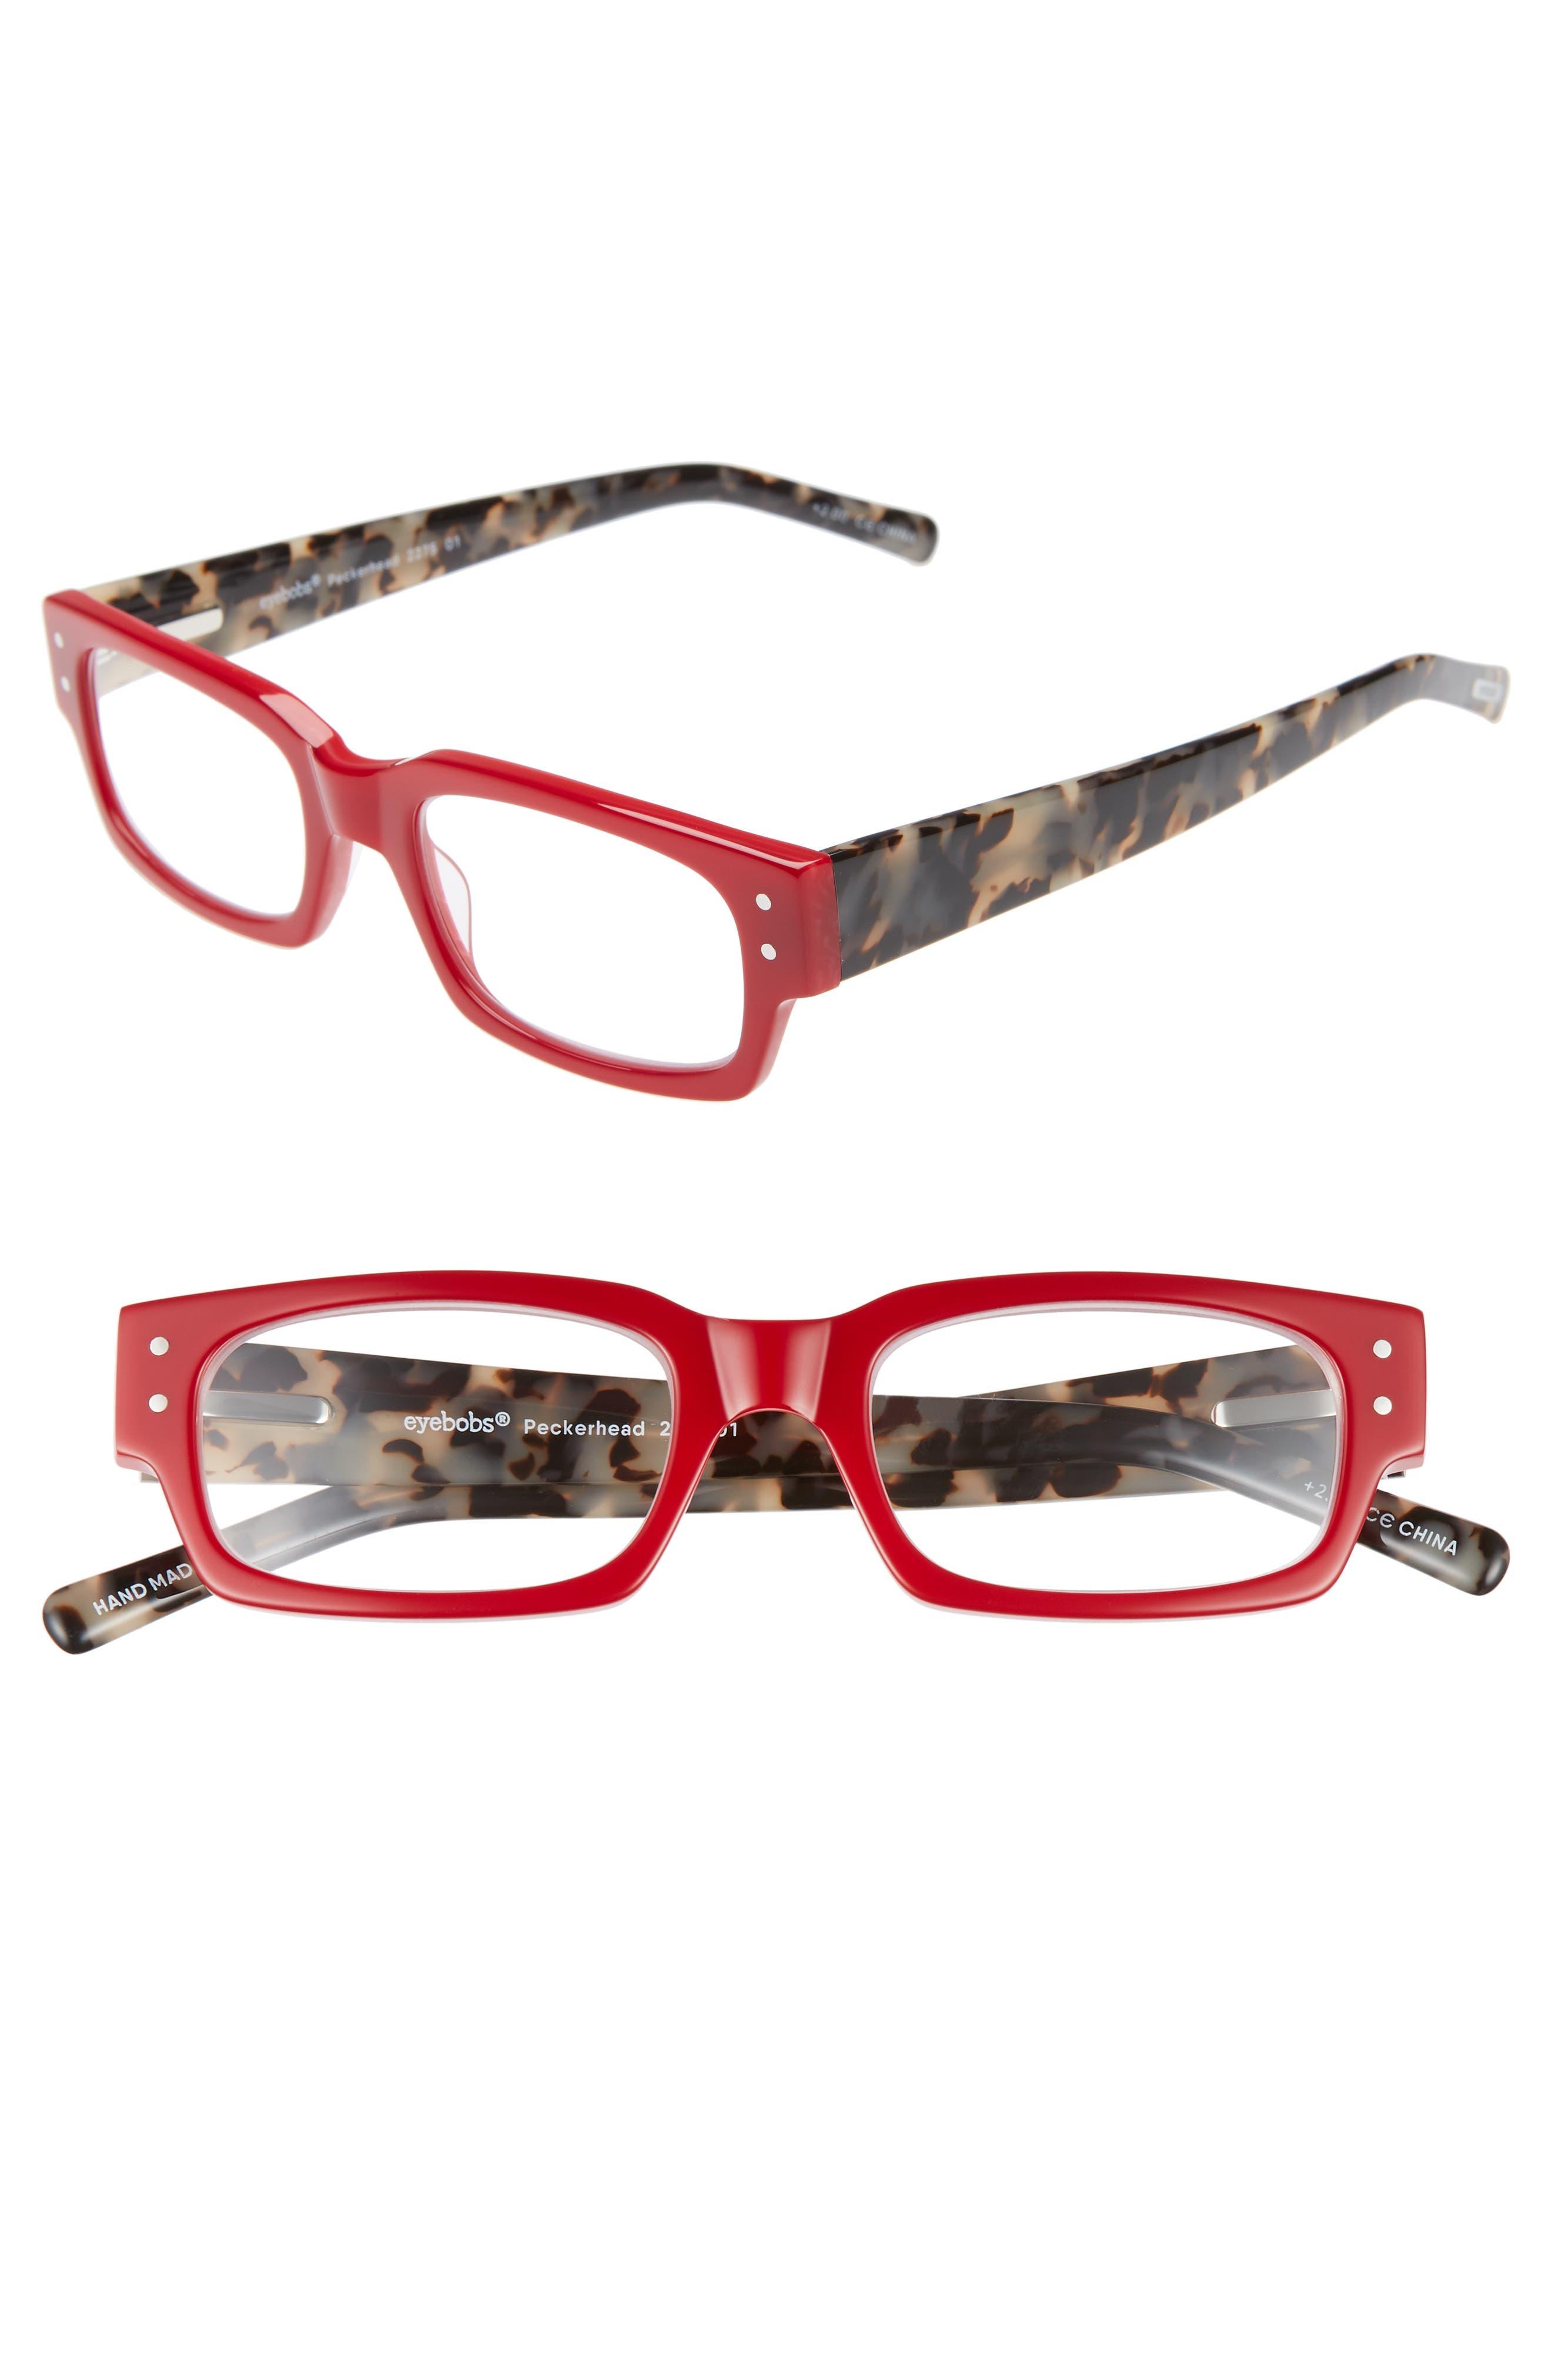 Peckerhead 50mm Reading Glasses